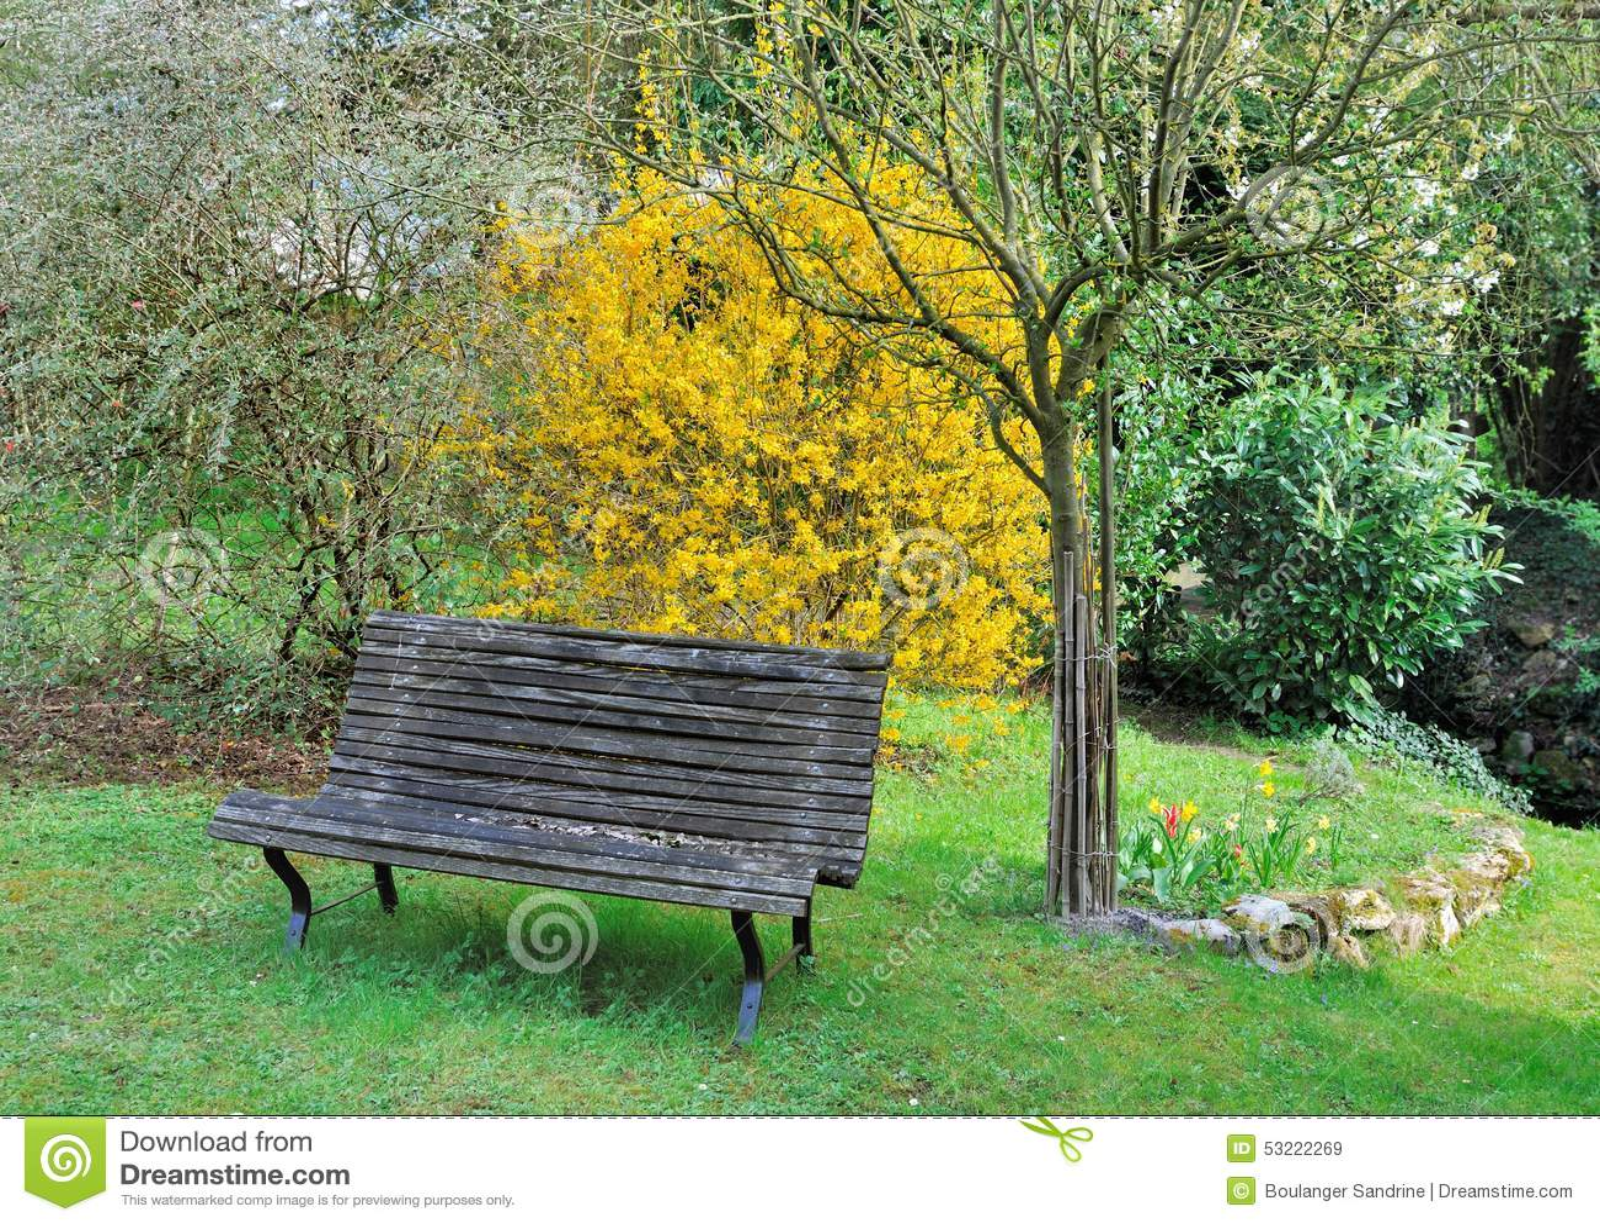 Wooden Bench In Garden Stock Photo - Image: 53222269